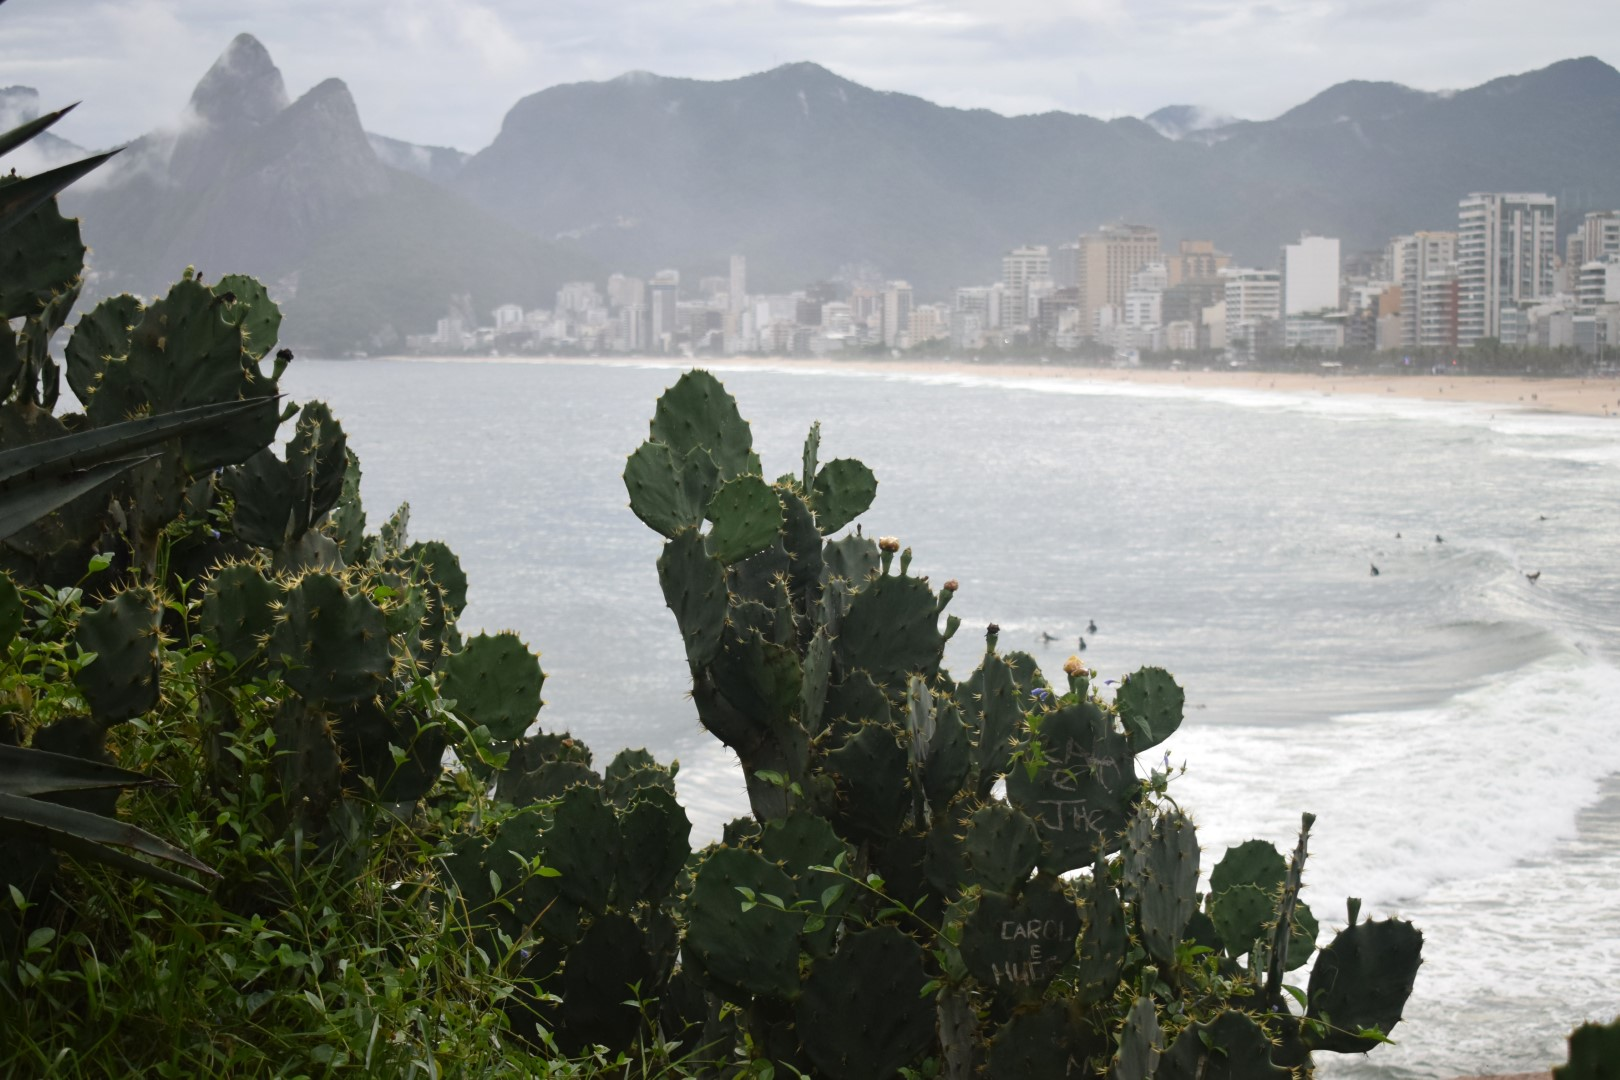 Ipanema from the Pedra do Arpoador